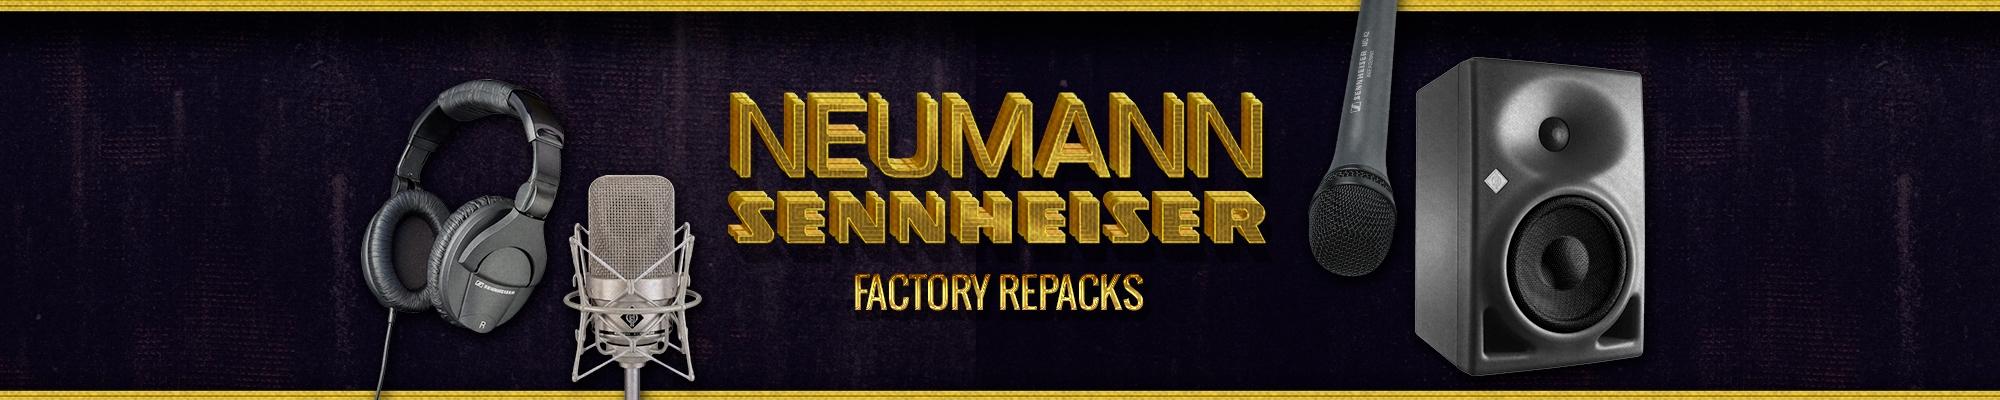 Neumann & Sennheiser Repacks